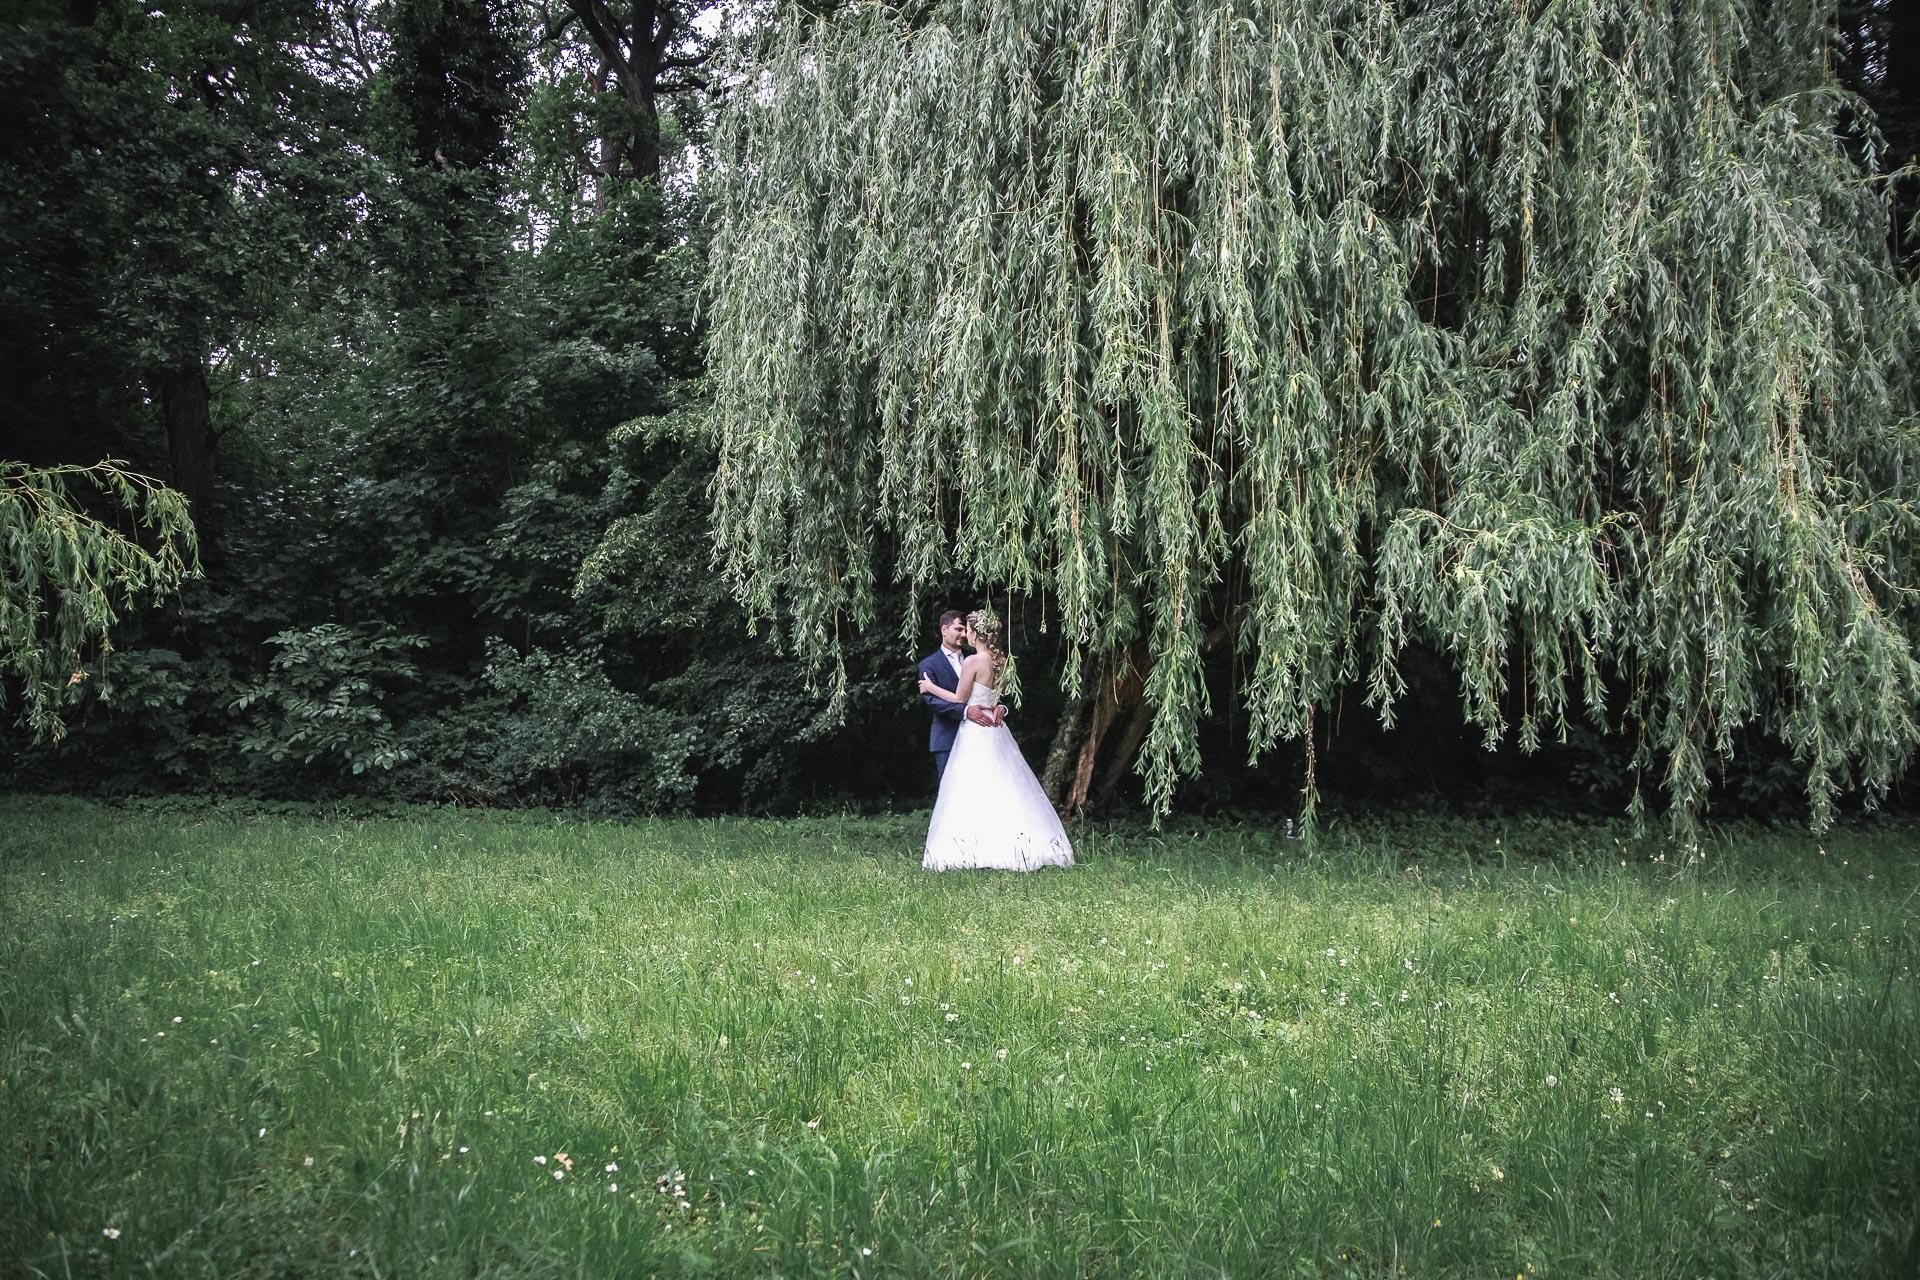 Svatební-fotograf-Nymburk-6396